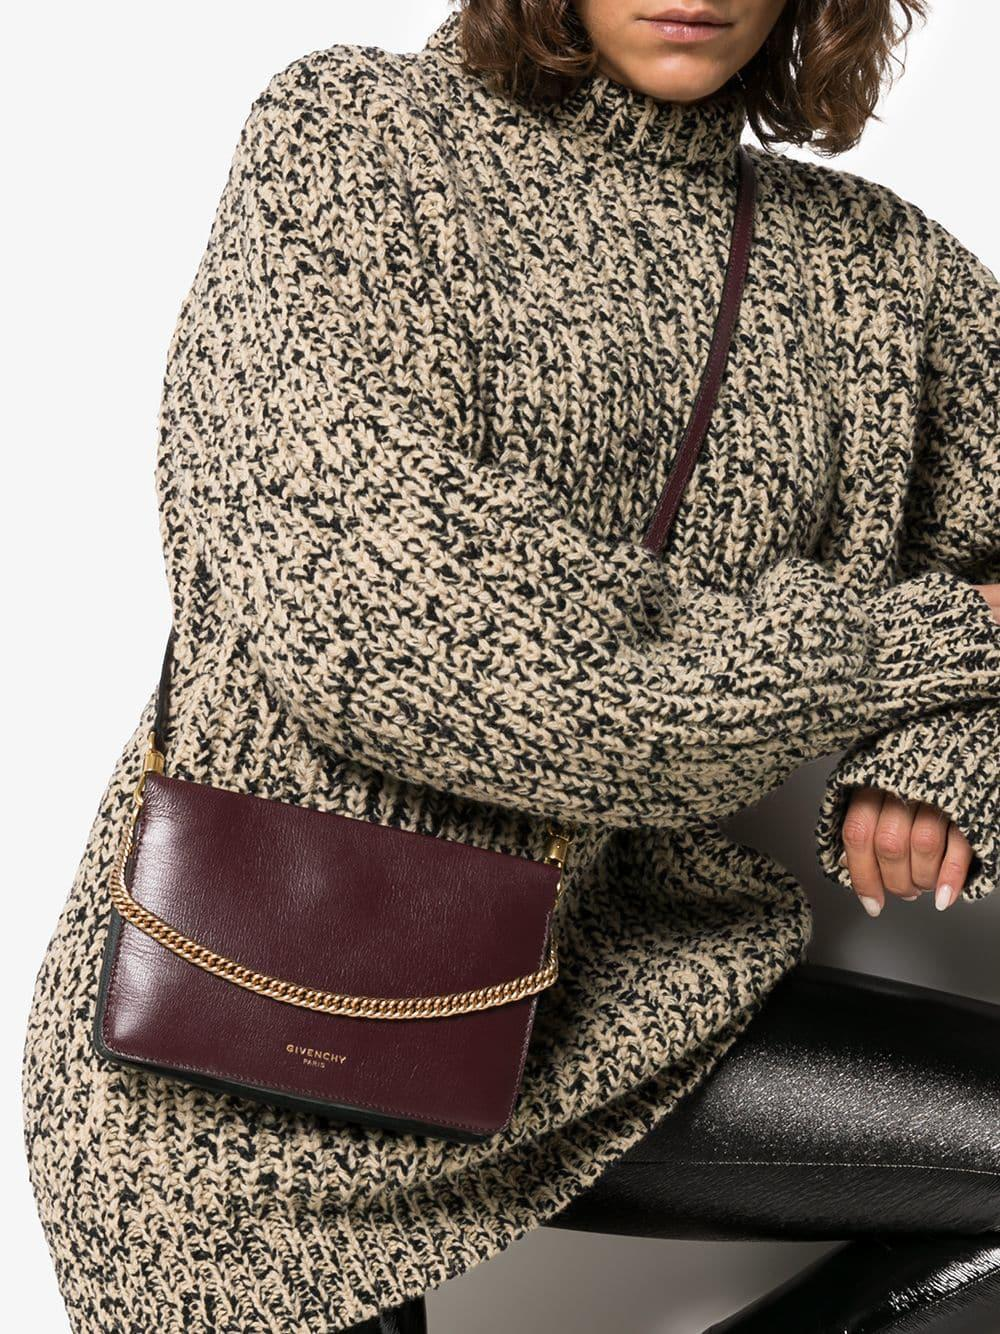 f6bdb19b05 Lyst - Givenchy Burgundy Cross3 Leather Cross-body Bag in Pink